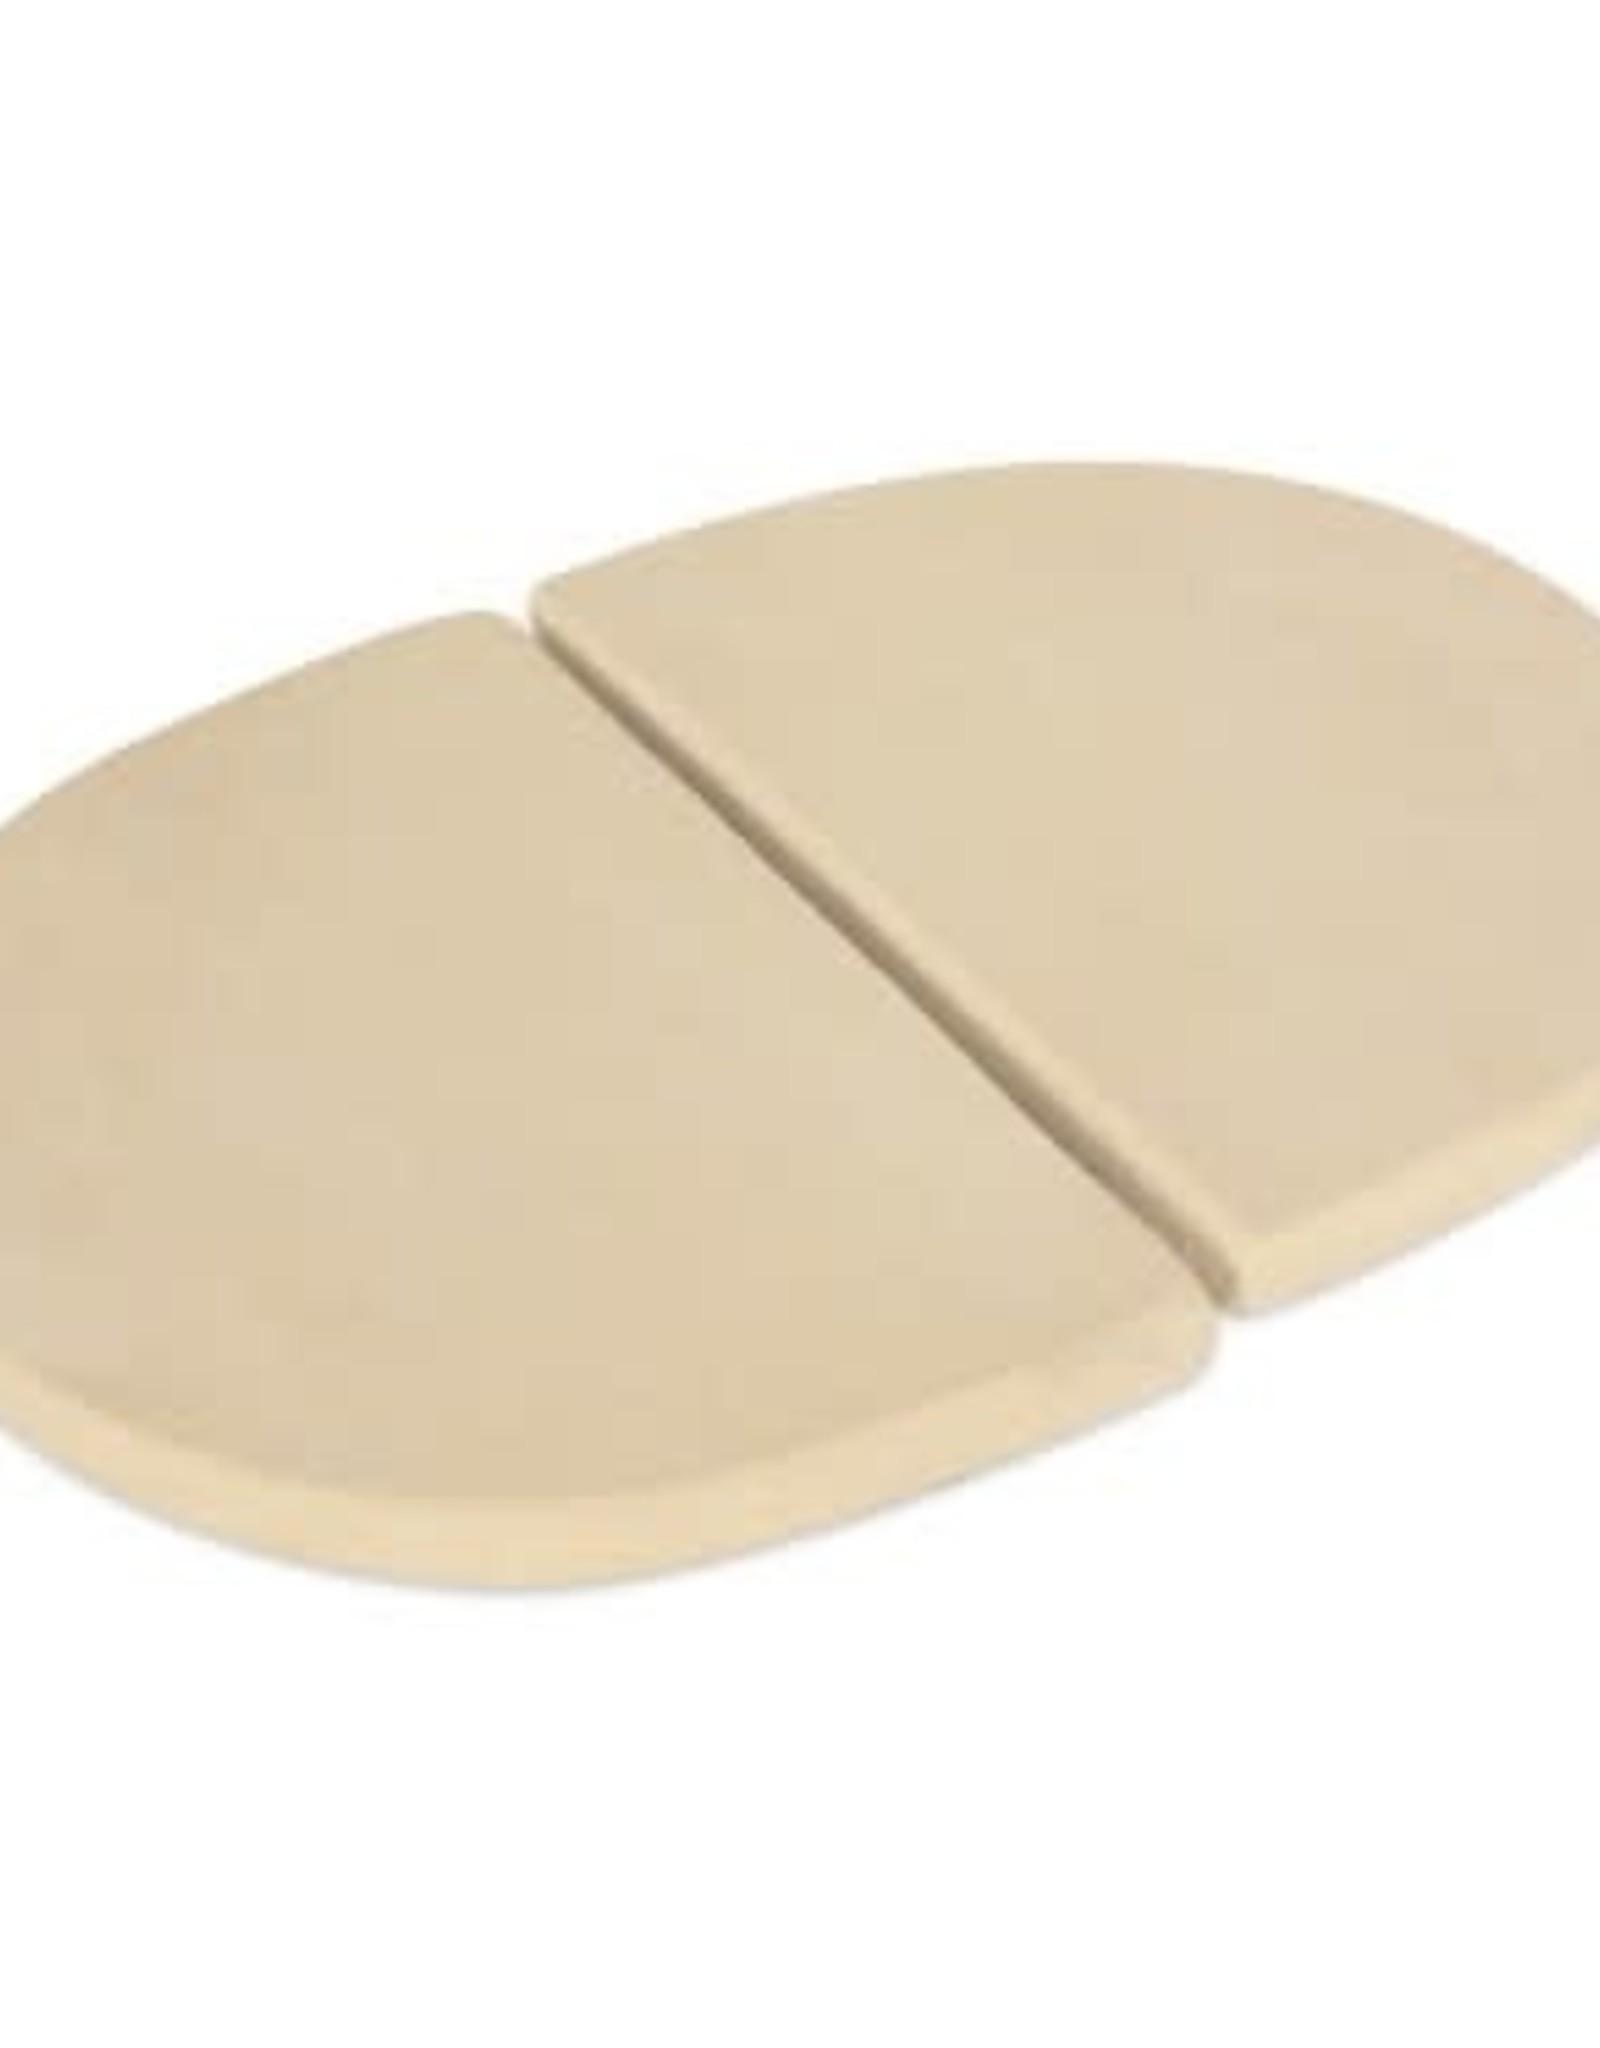 Primo Ceramic Grills Primo Ceramic Heat Deflector Plates for Oval LG 300, Set of 2 #326